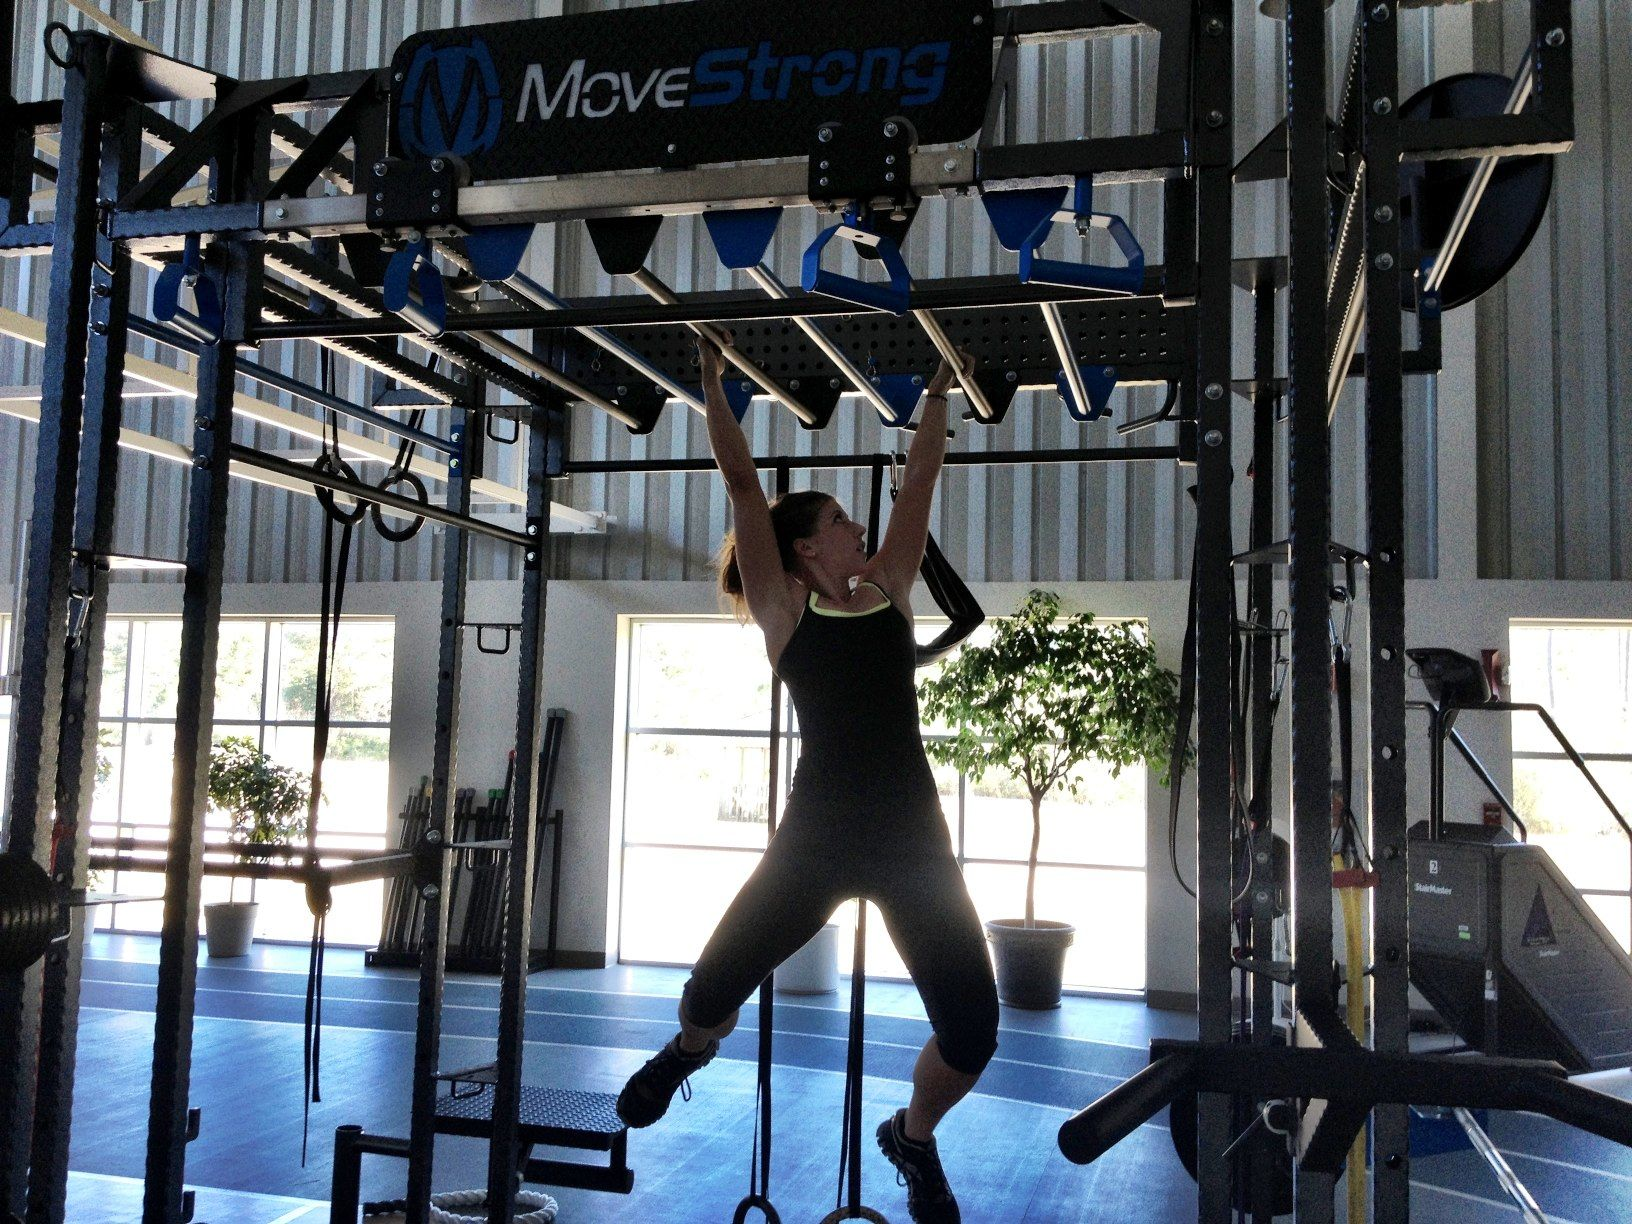 Gym-Monkey bars- training-equipment